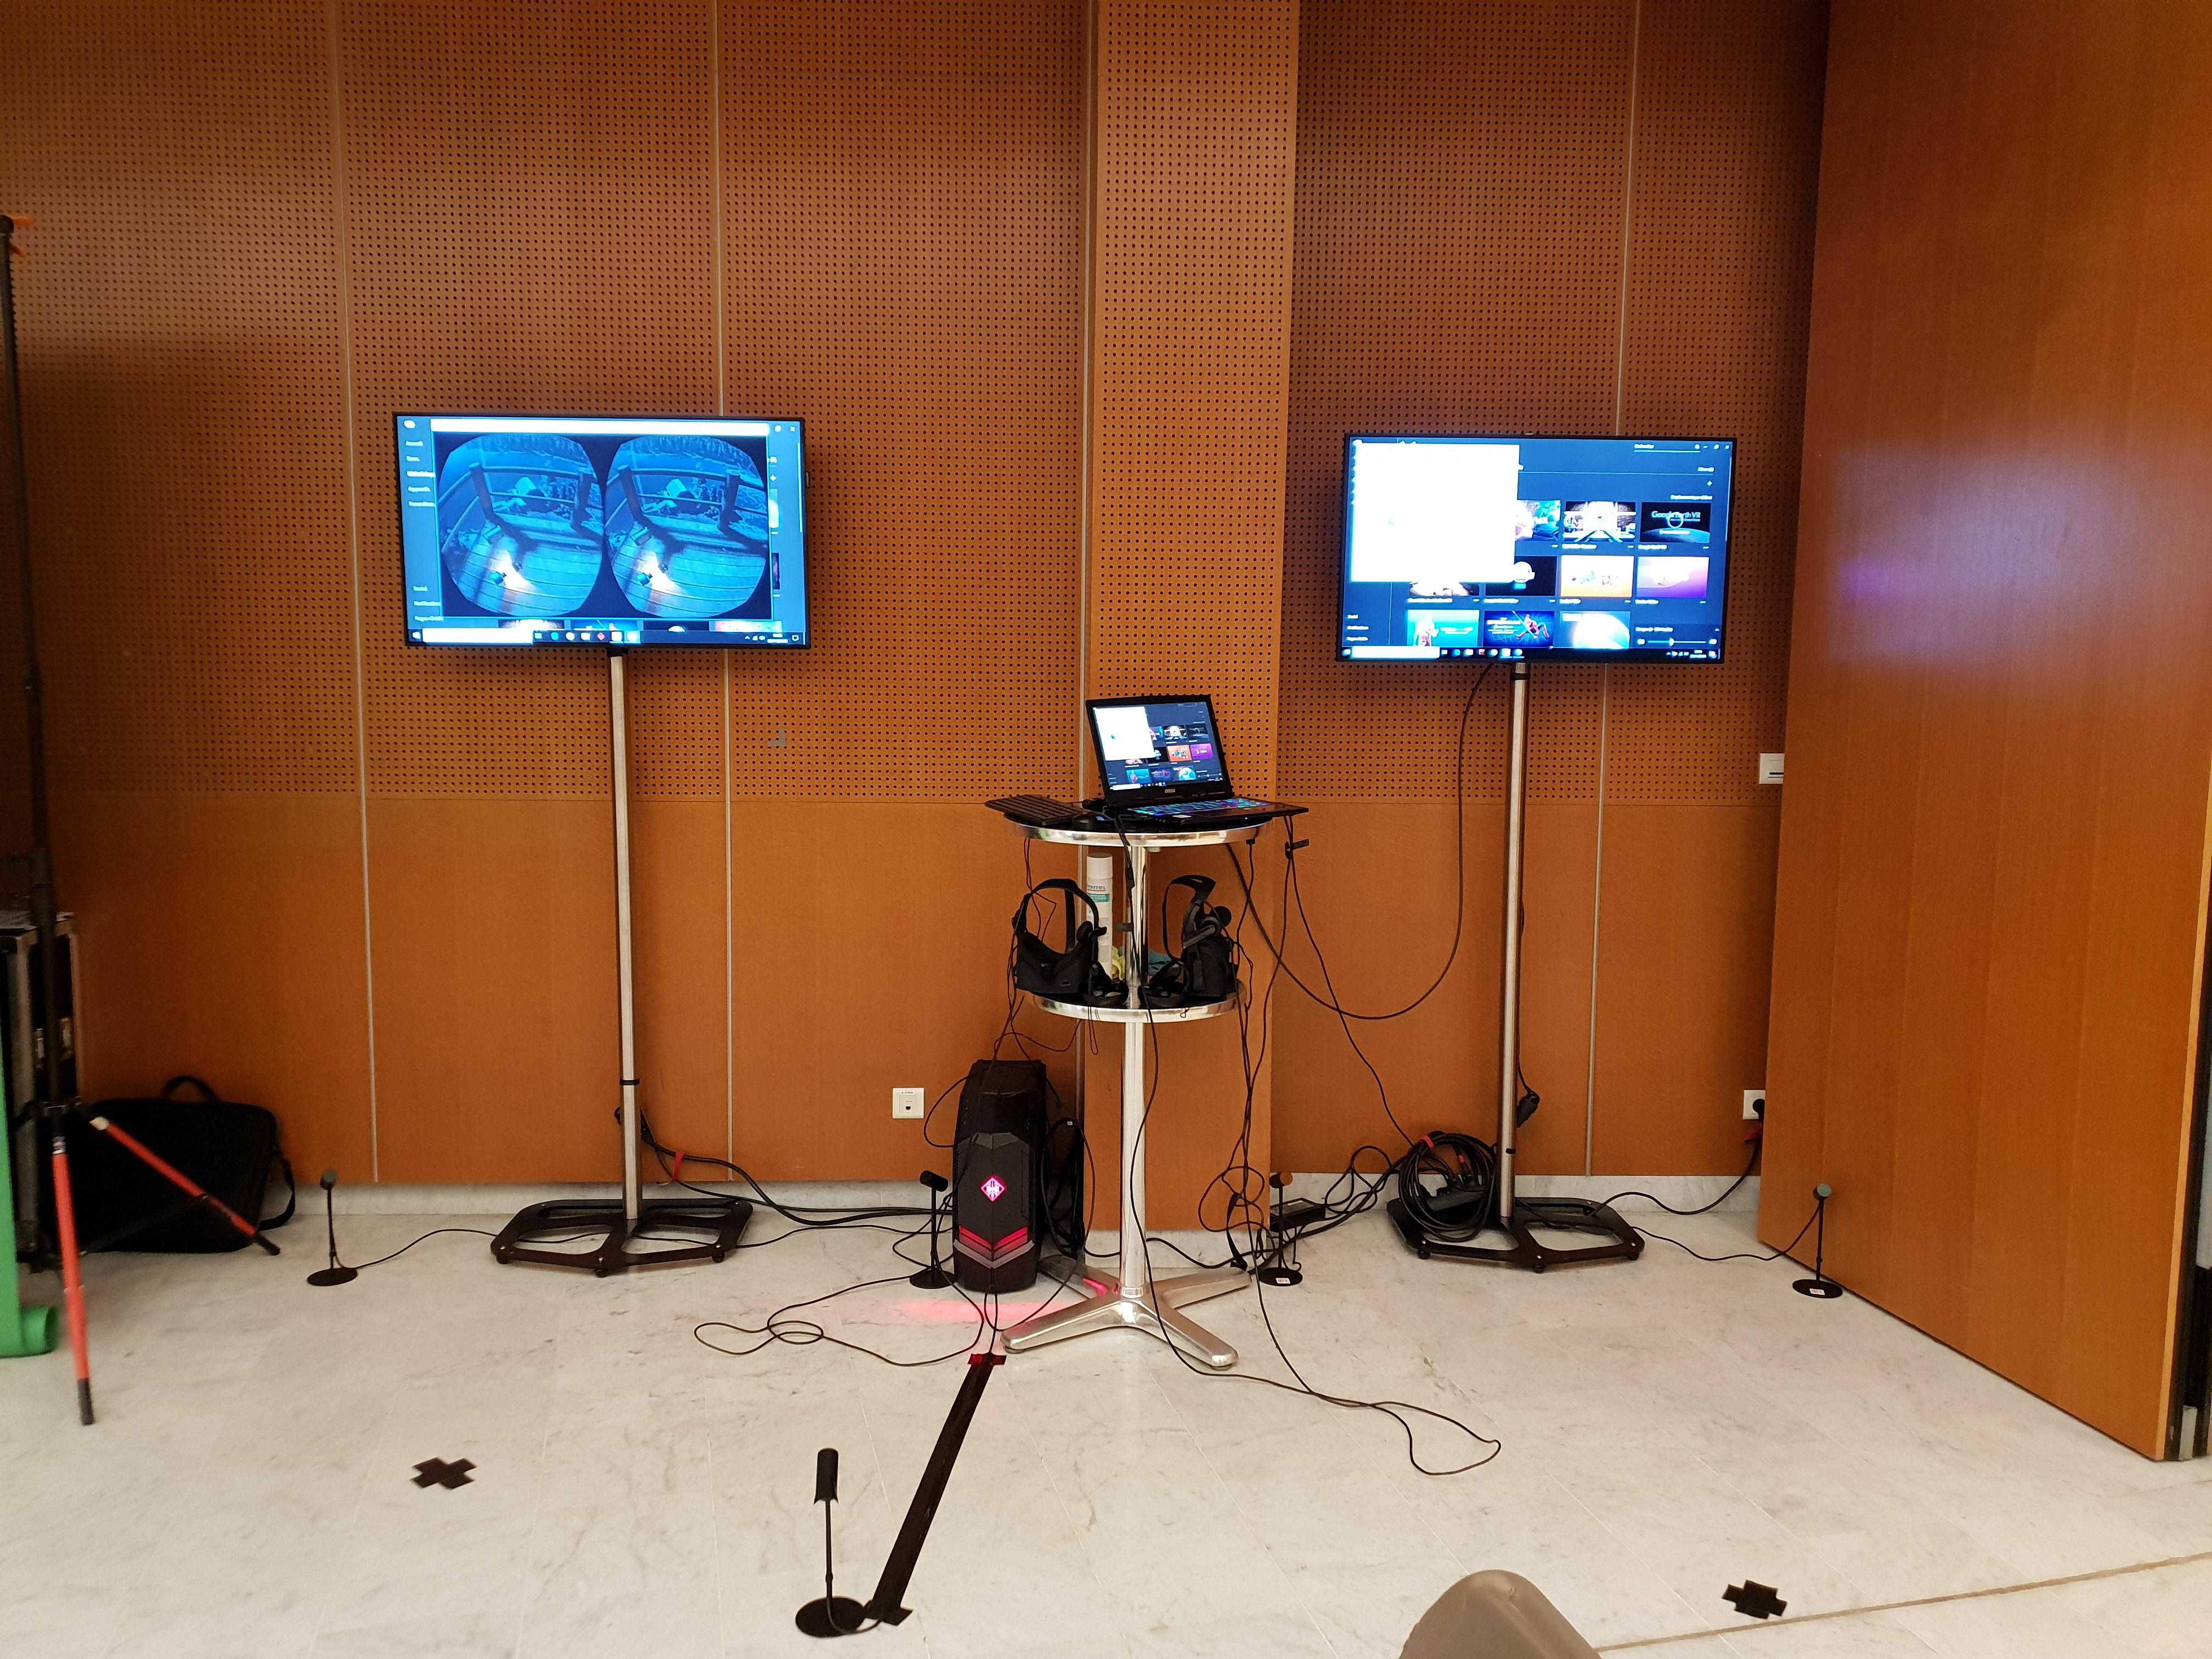 20181109_184505 Animation VR pour une mairie